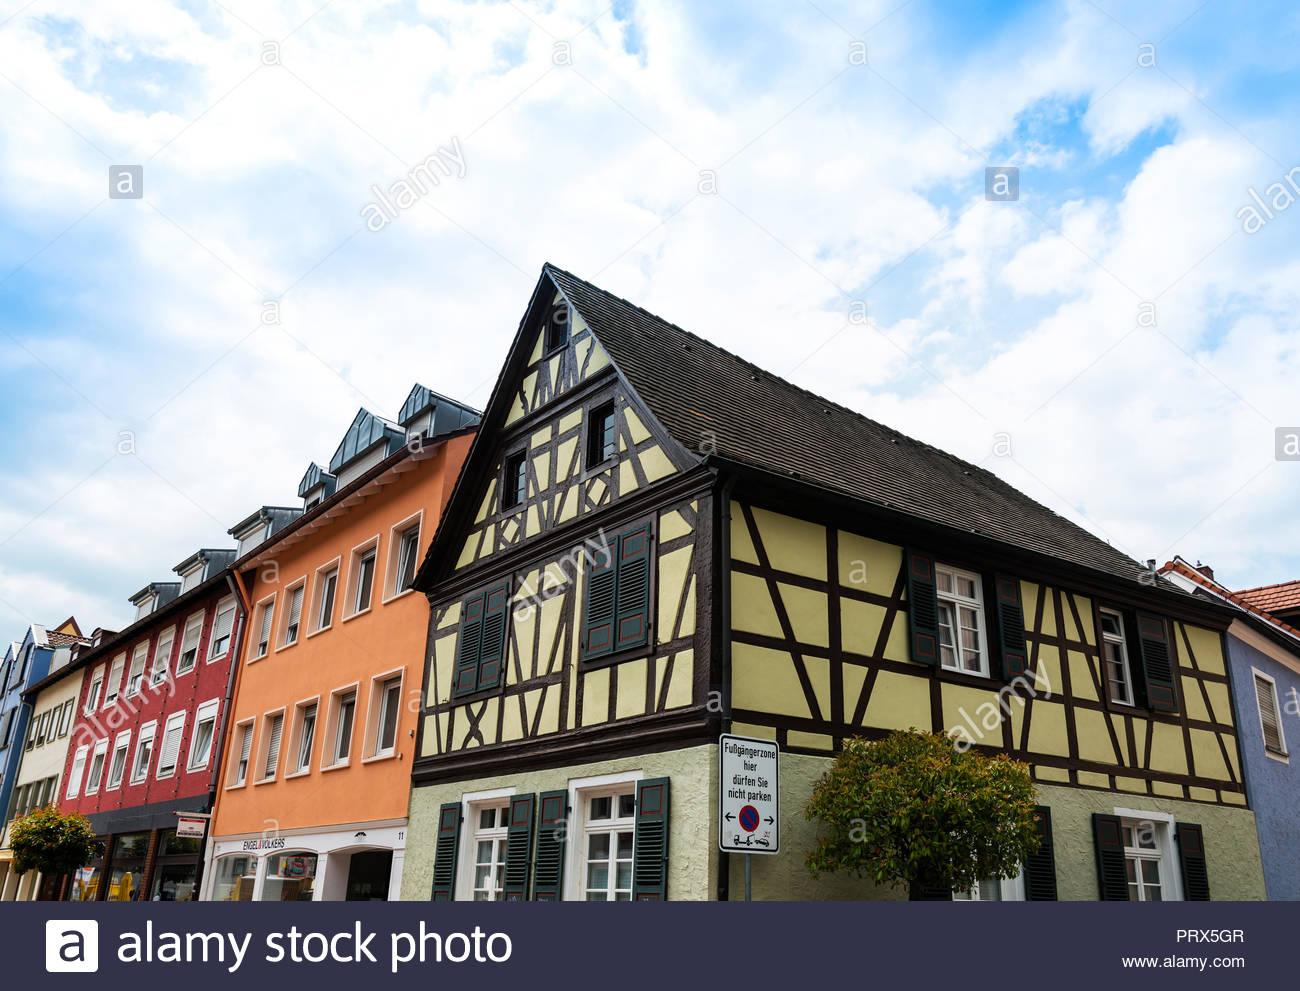 Maison Close Offenbourg – Ventana Blog concernant Maison Amour Offenburg